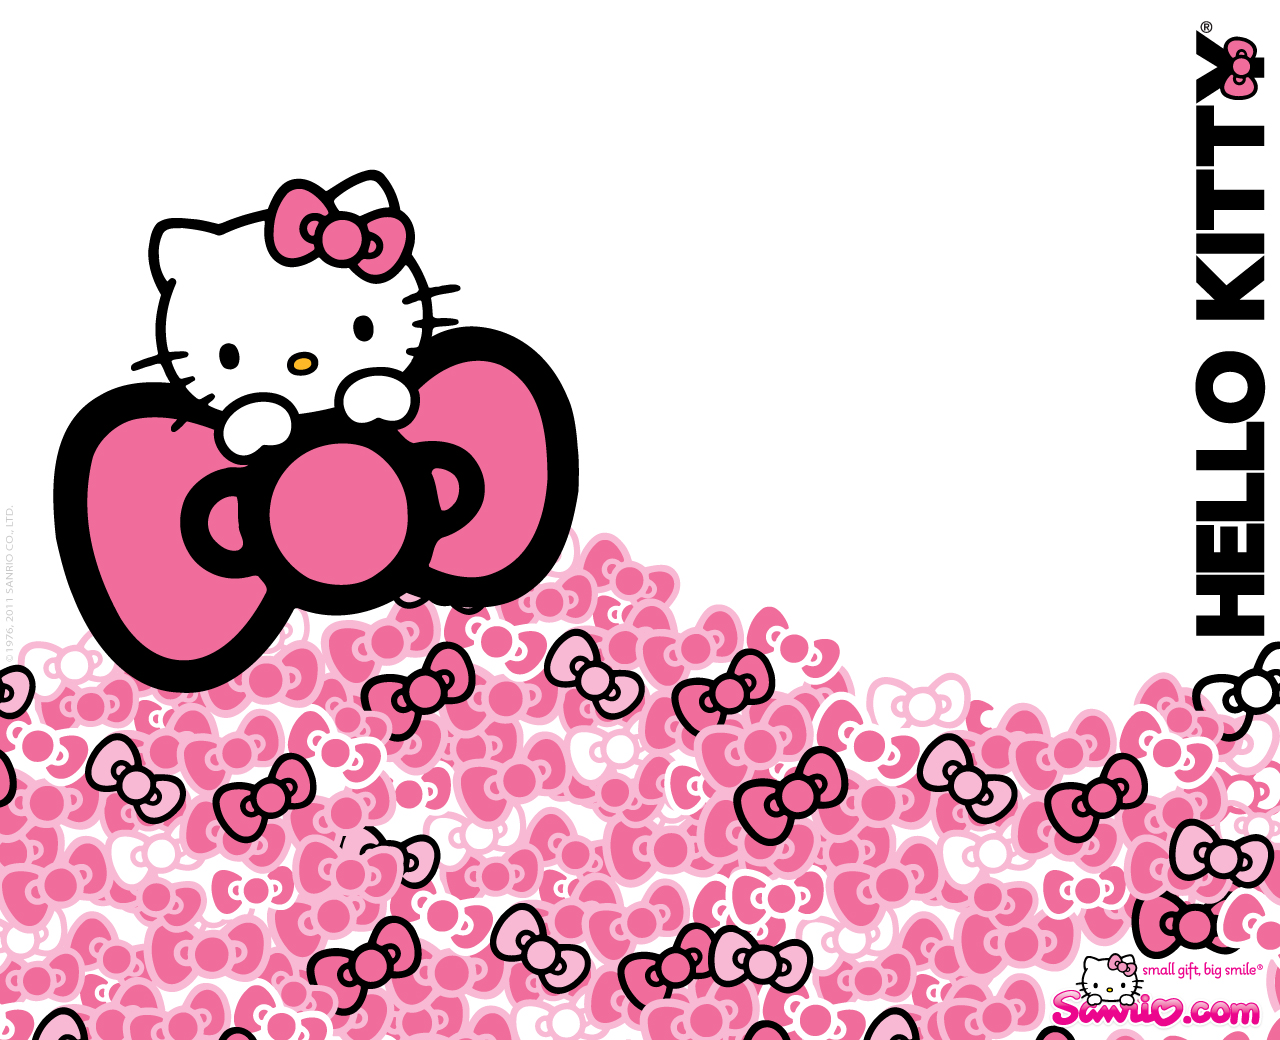 Namn:  Hello-kitty-Wallpapers-From-Sanrio-Website.jpg Visningar: 877 Storlek:  621.8 KB